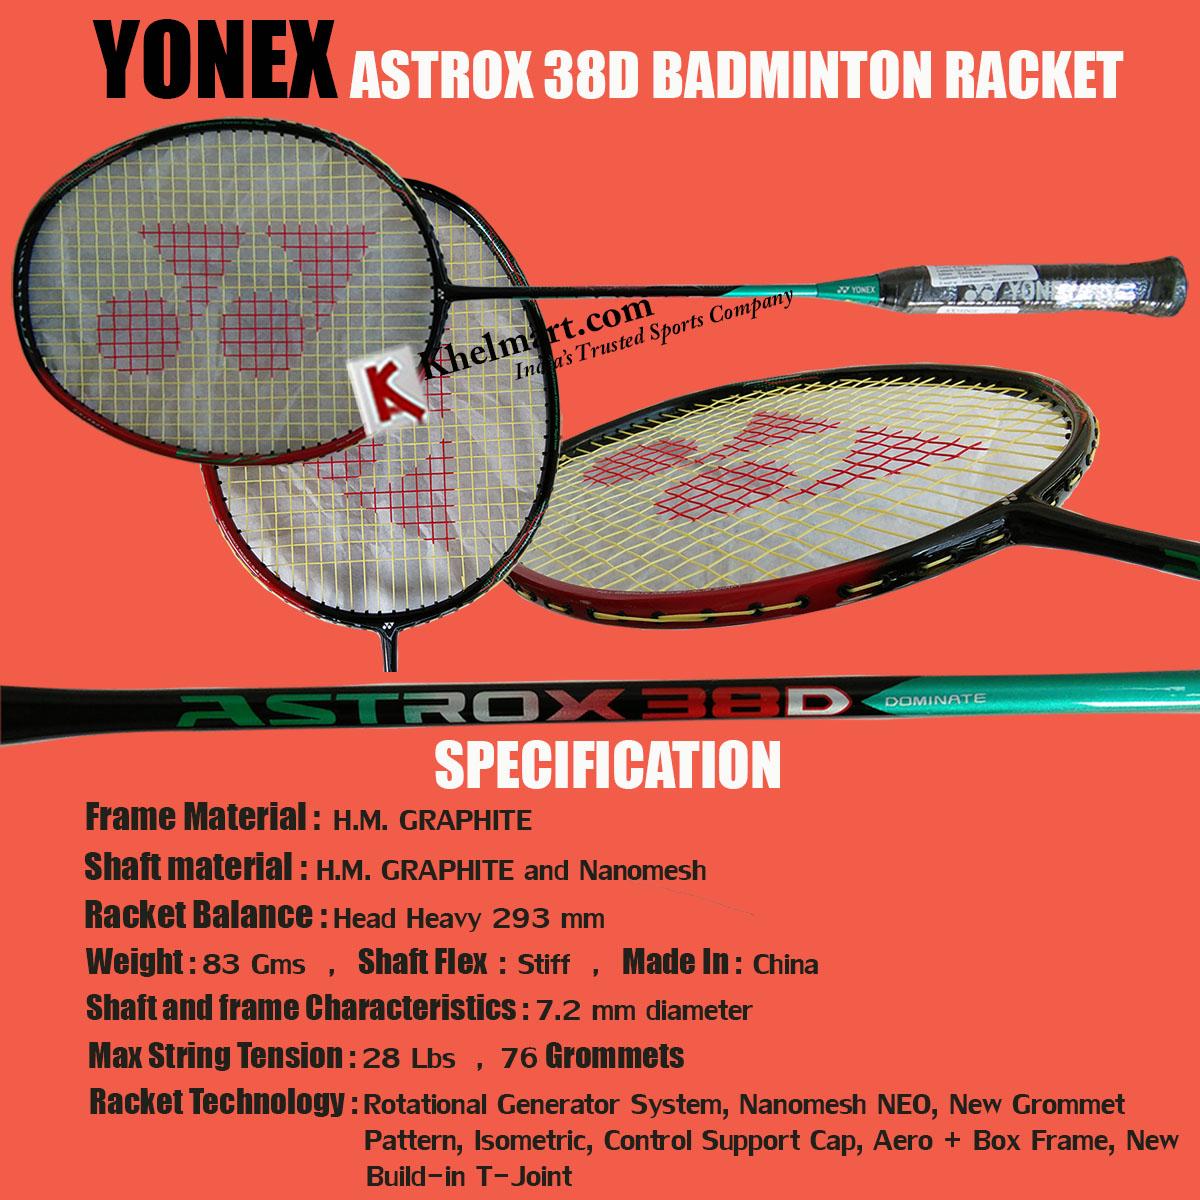 YONEX_ASTROX_38_D_BADMINTON_RACKET